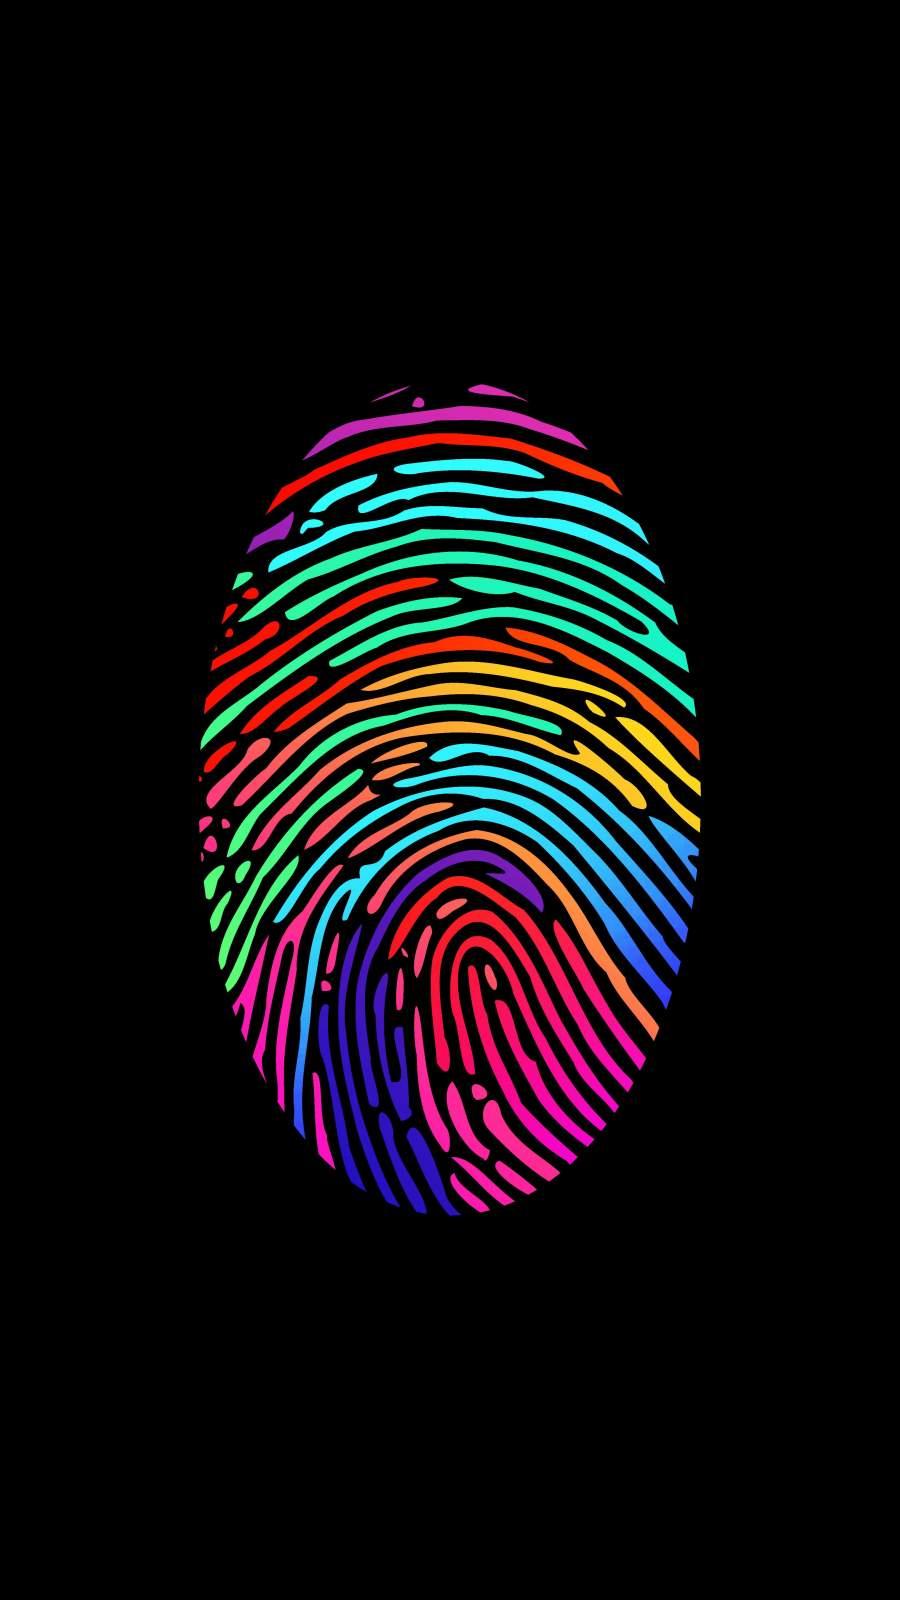 Fingerprint Amoled iPhone Wallpaper